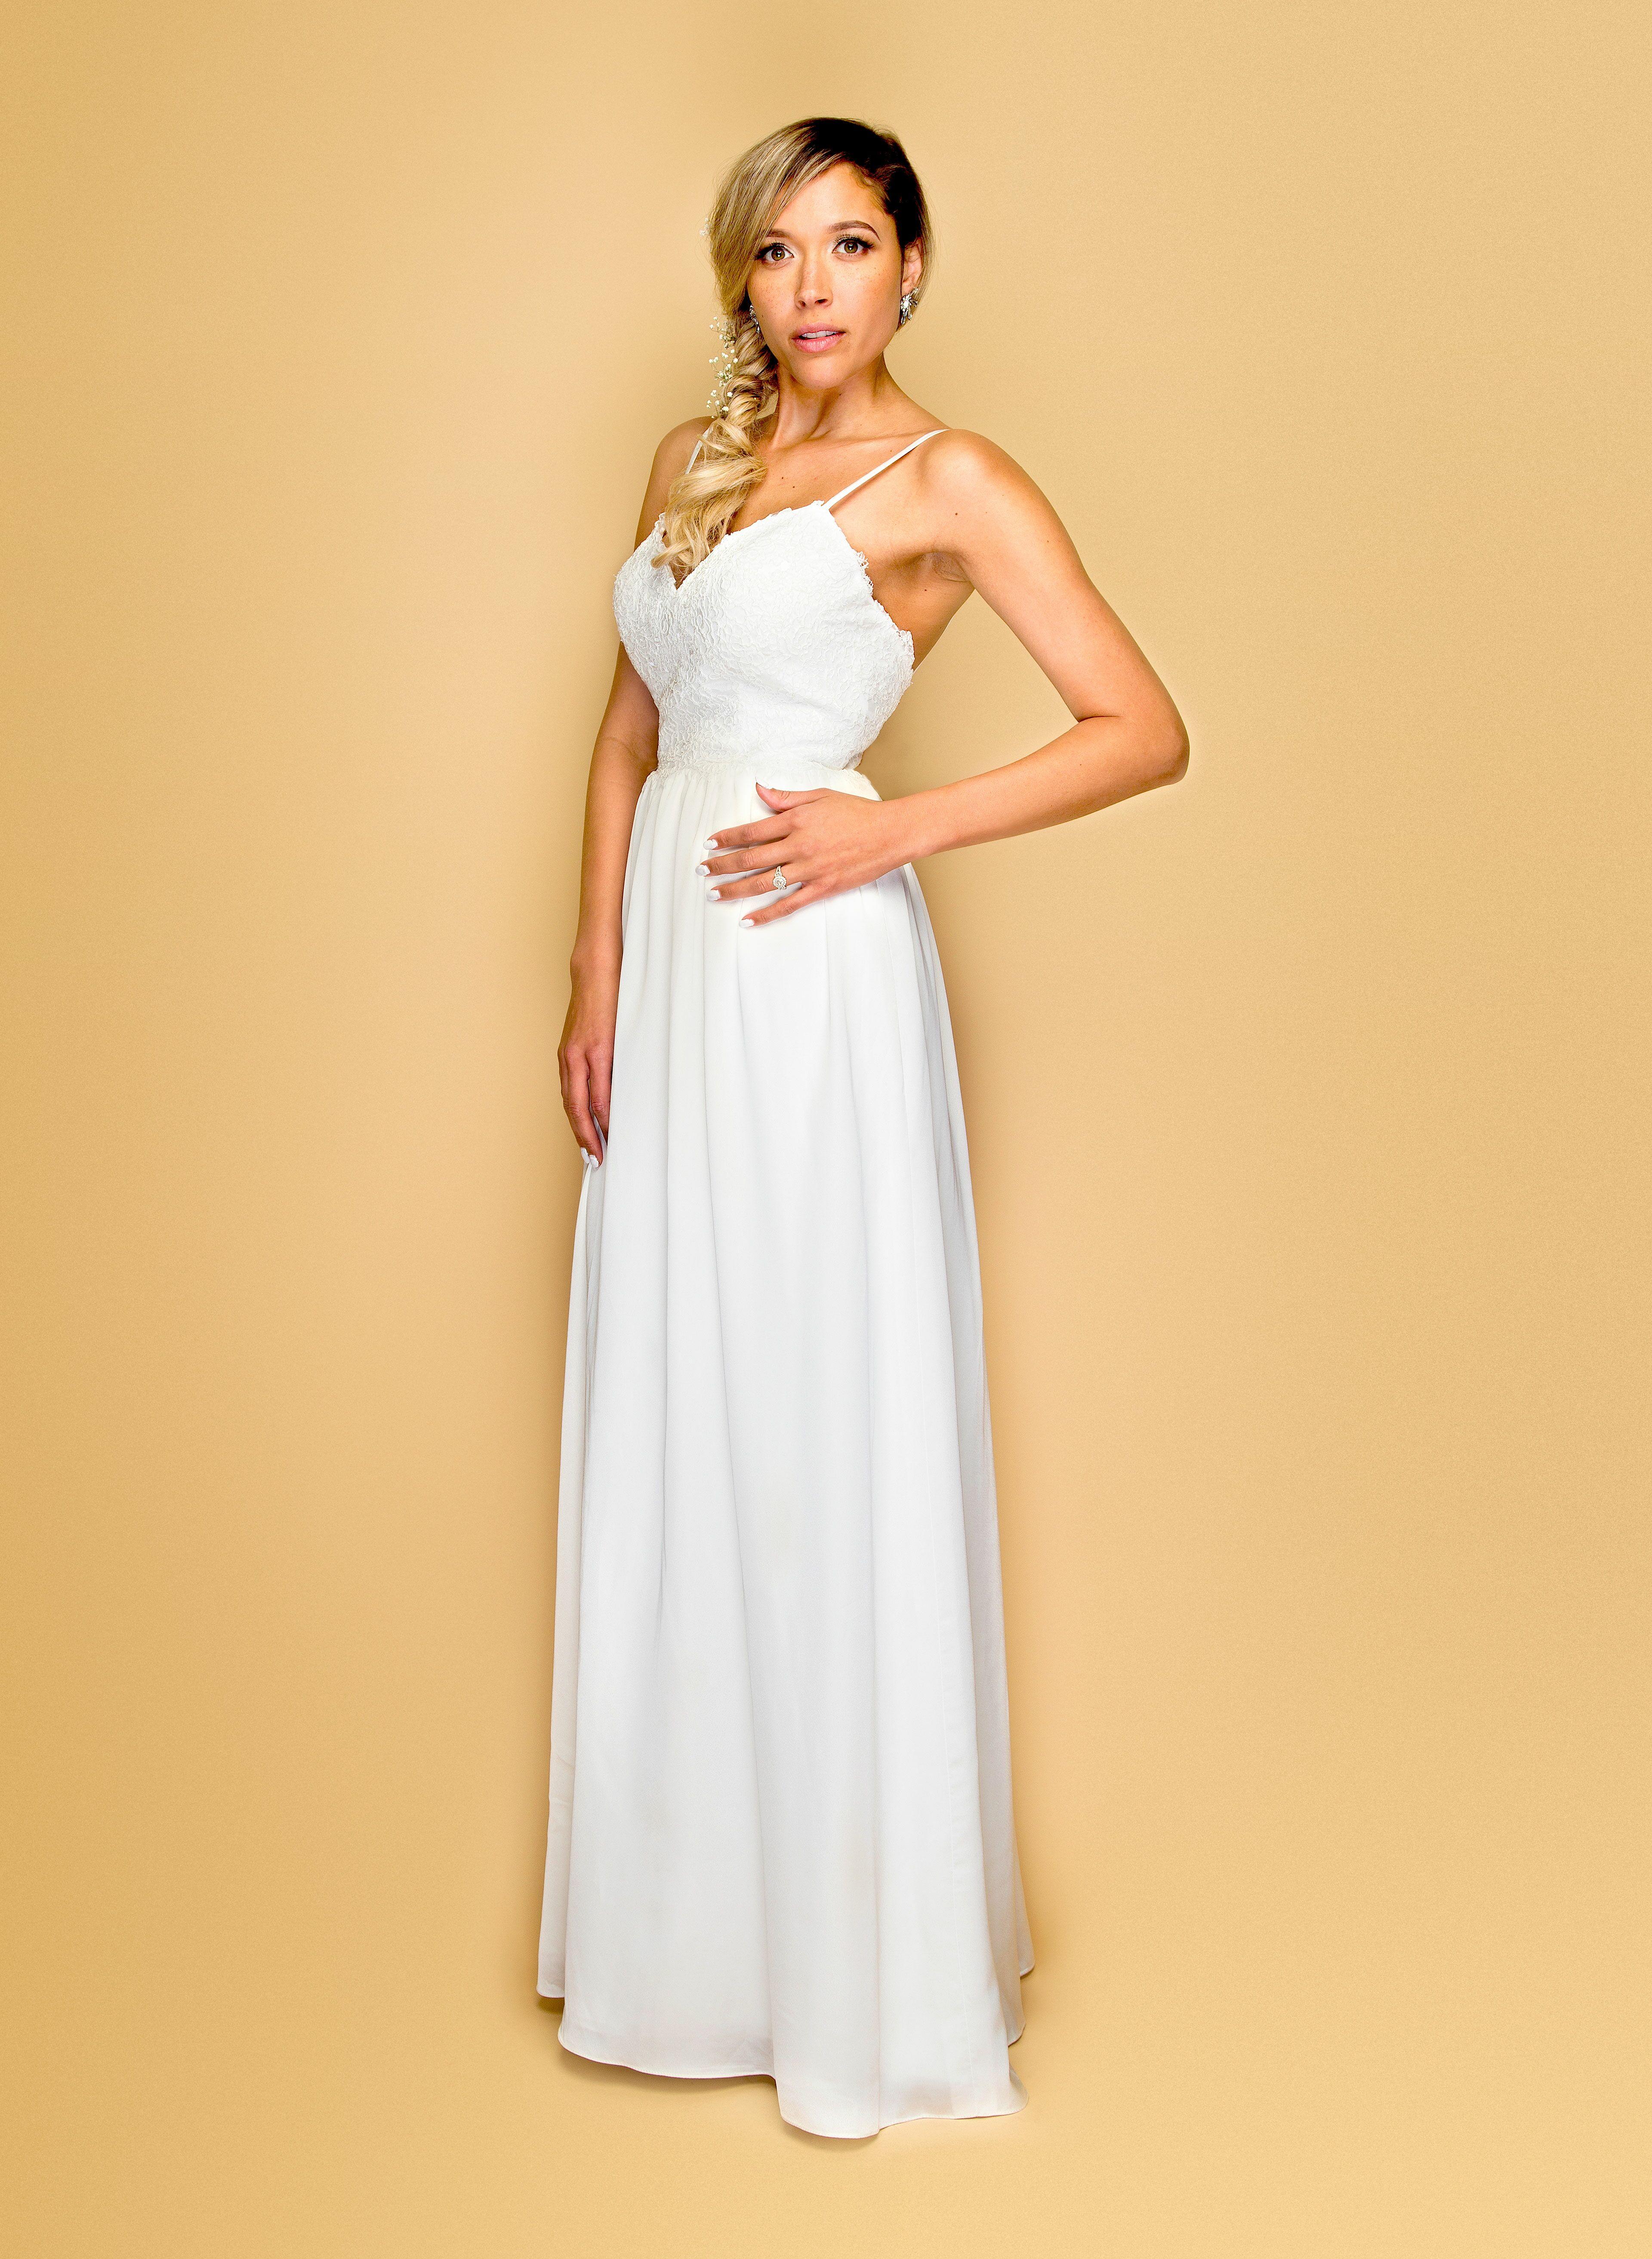 Bridal Salons in Atlanta, GA - The Knot